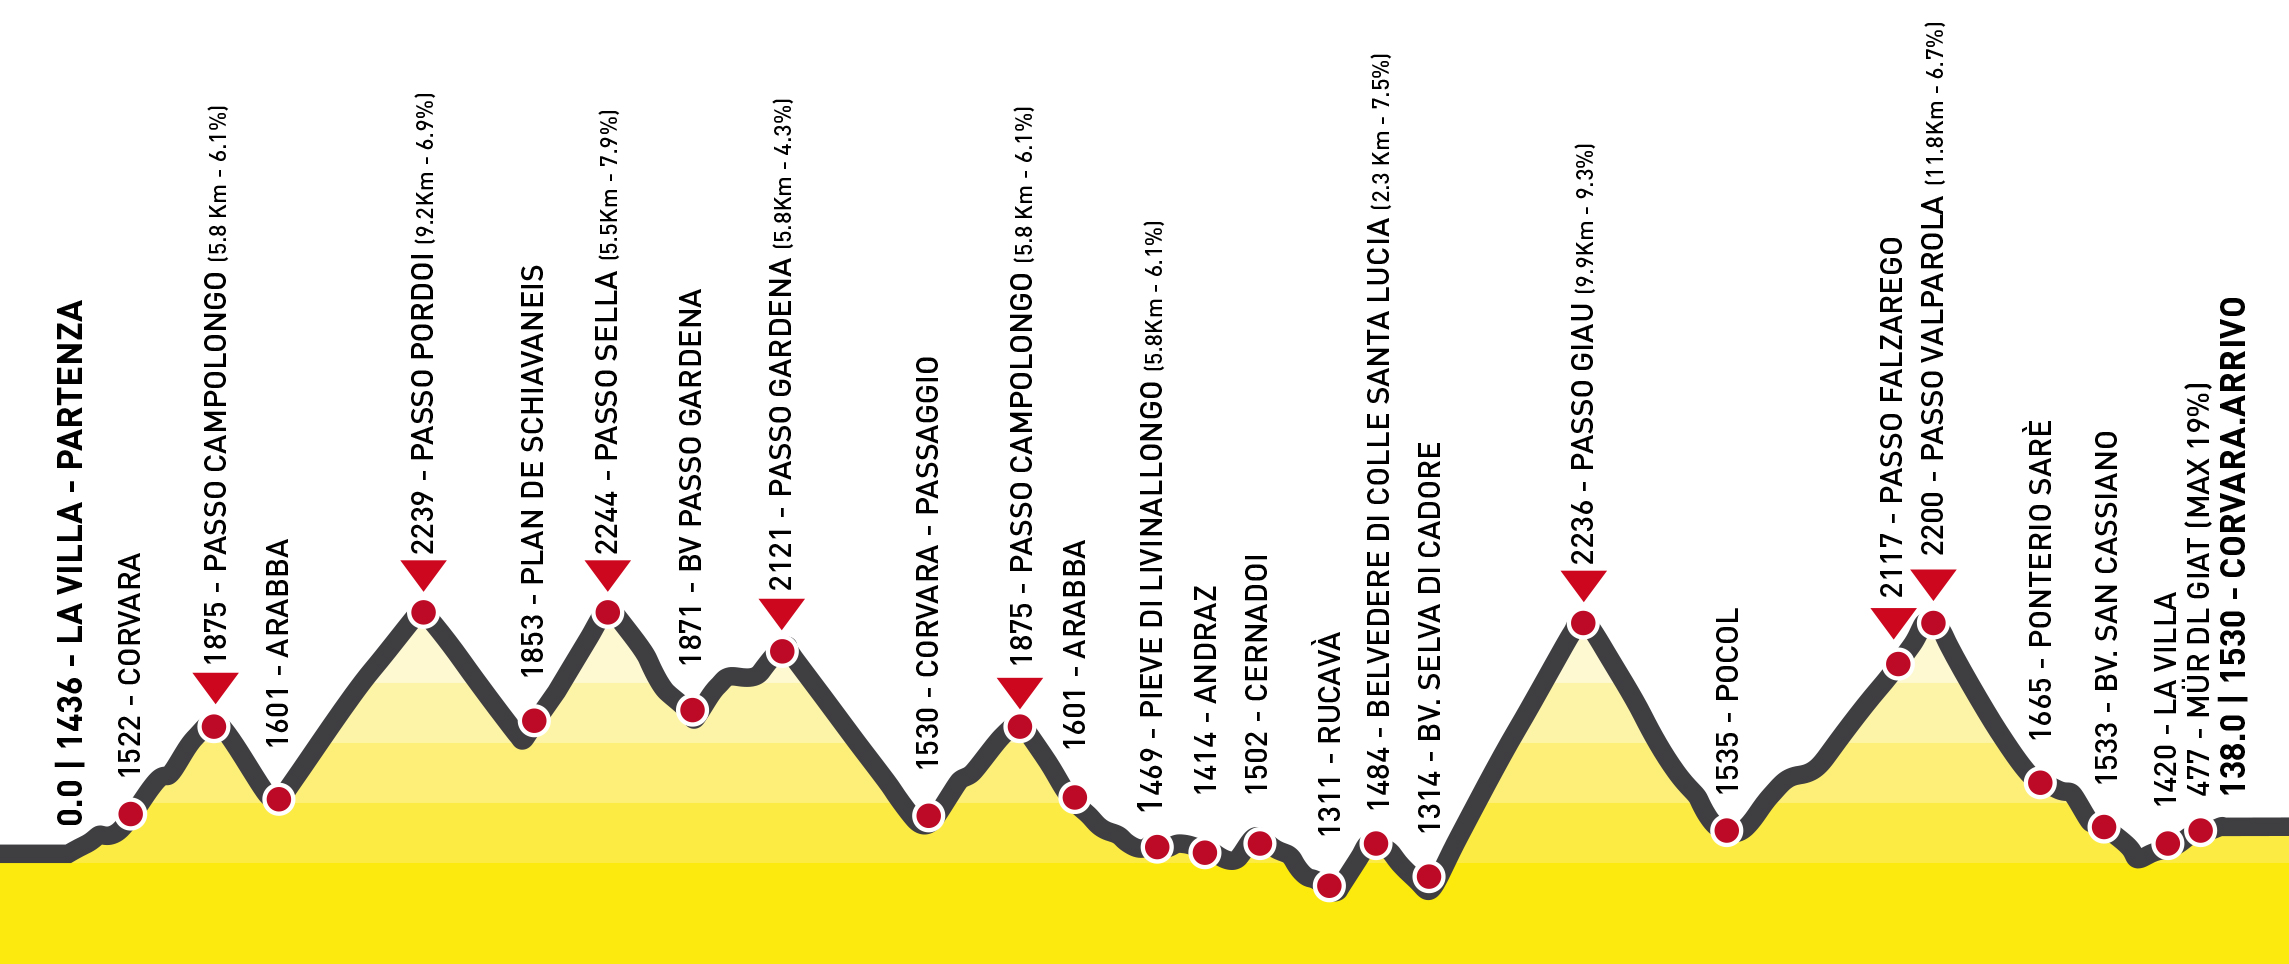 Maratona dles Dolomites Höhenprofil Maratonastrecke 2014